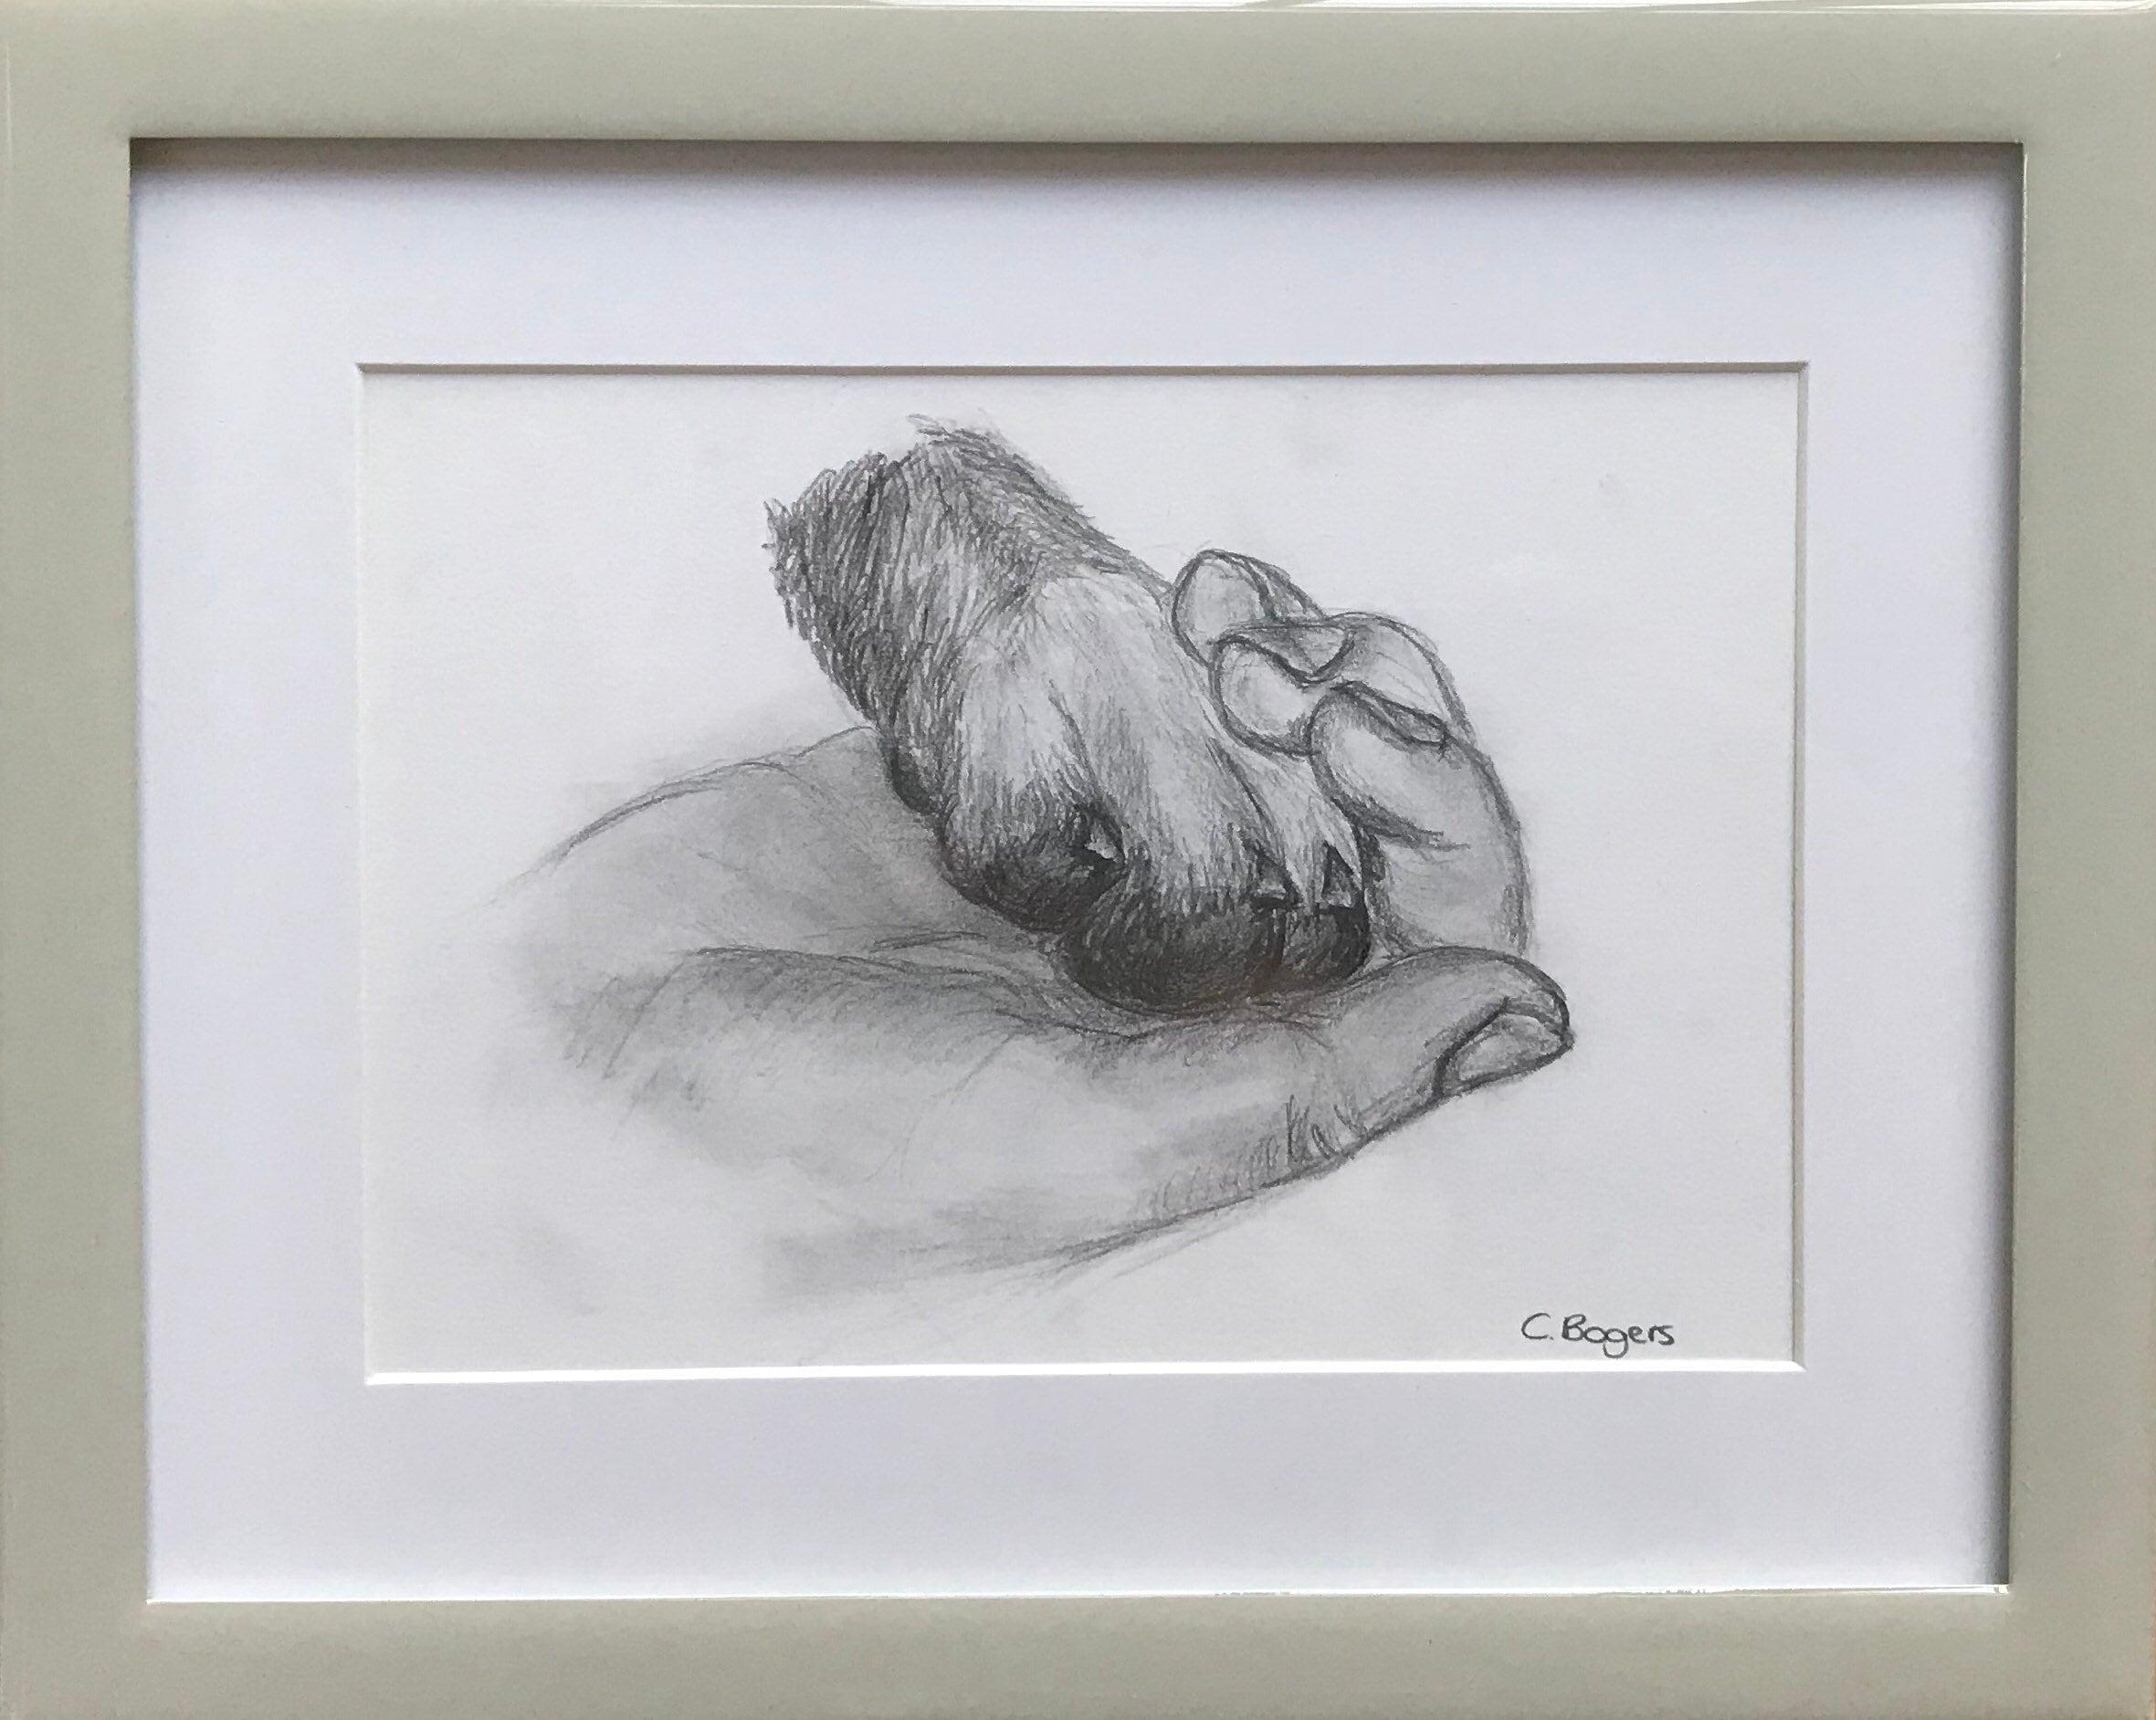 Mans best friend original framed pencil drawing